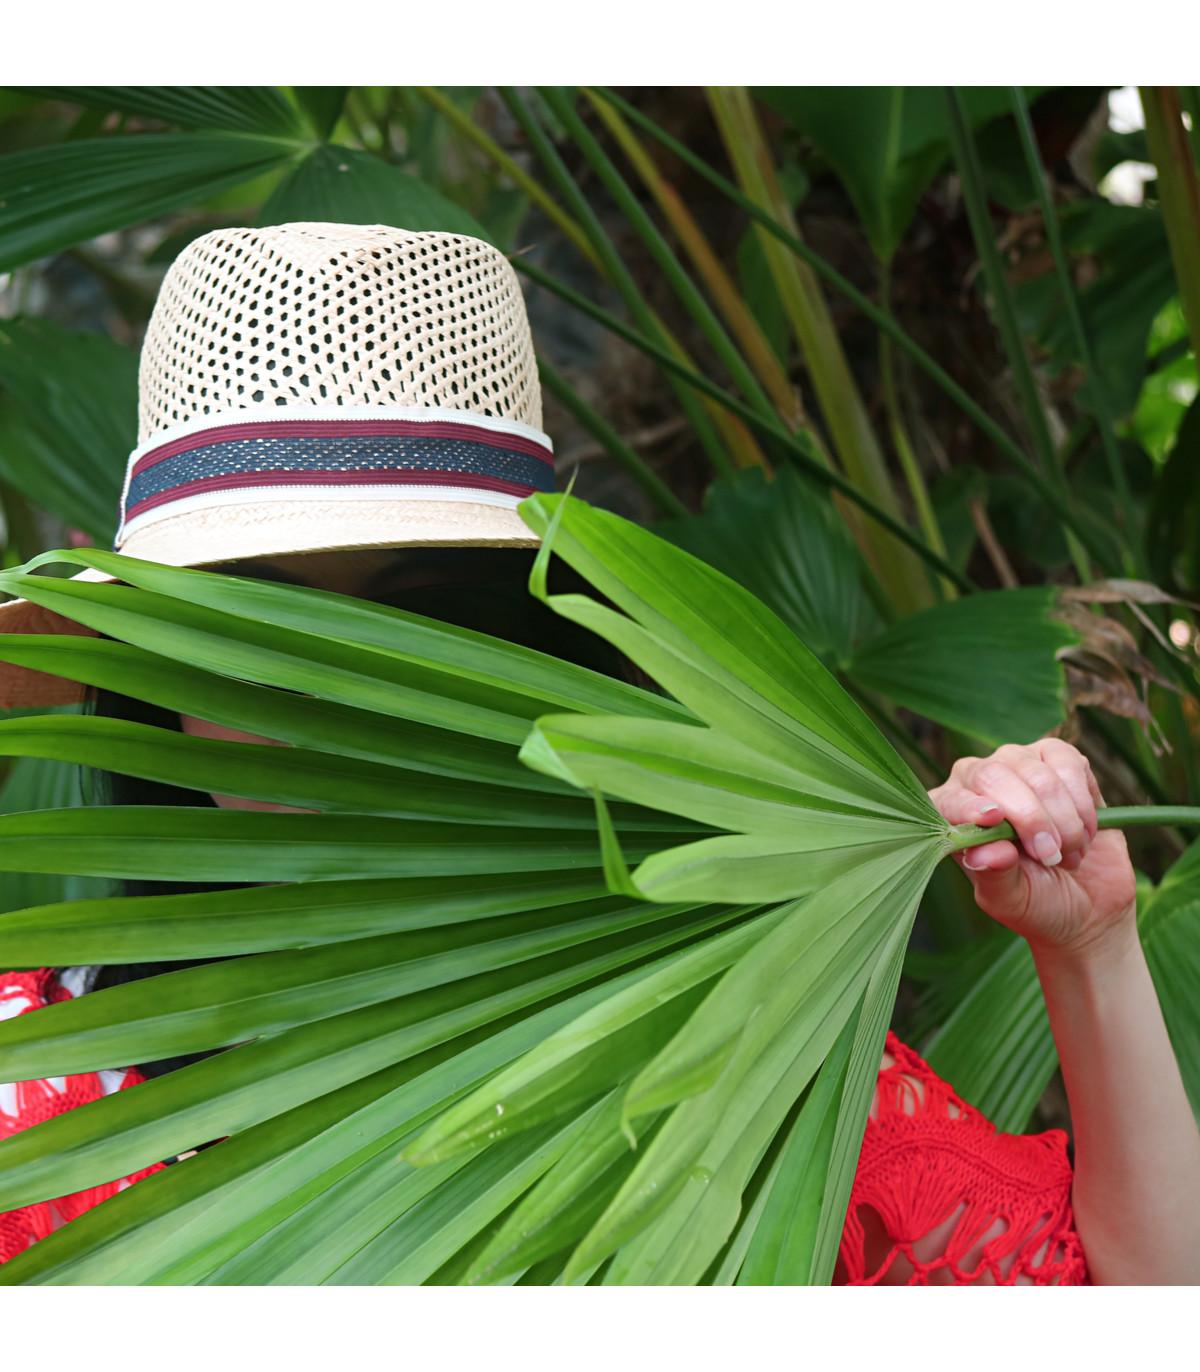 Palma - Carludovica rotundifolia